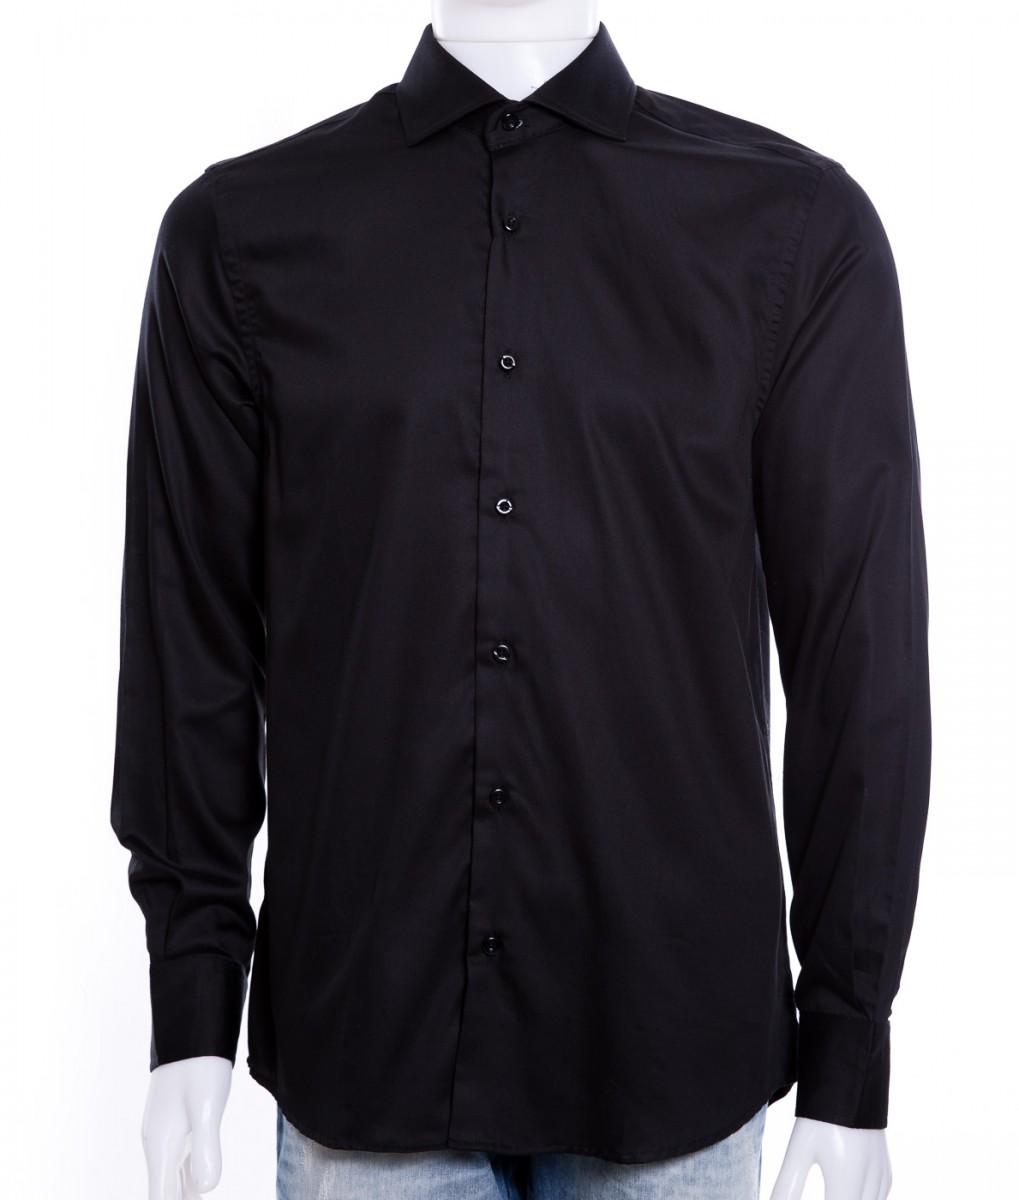 c31e69f02b Bizz Store - Camisa Social Masculina Luiz Eugenio Manga Longa Preta